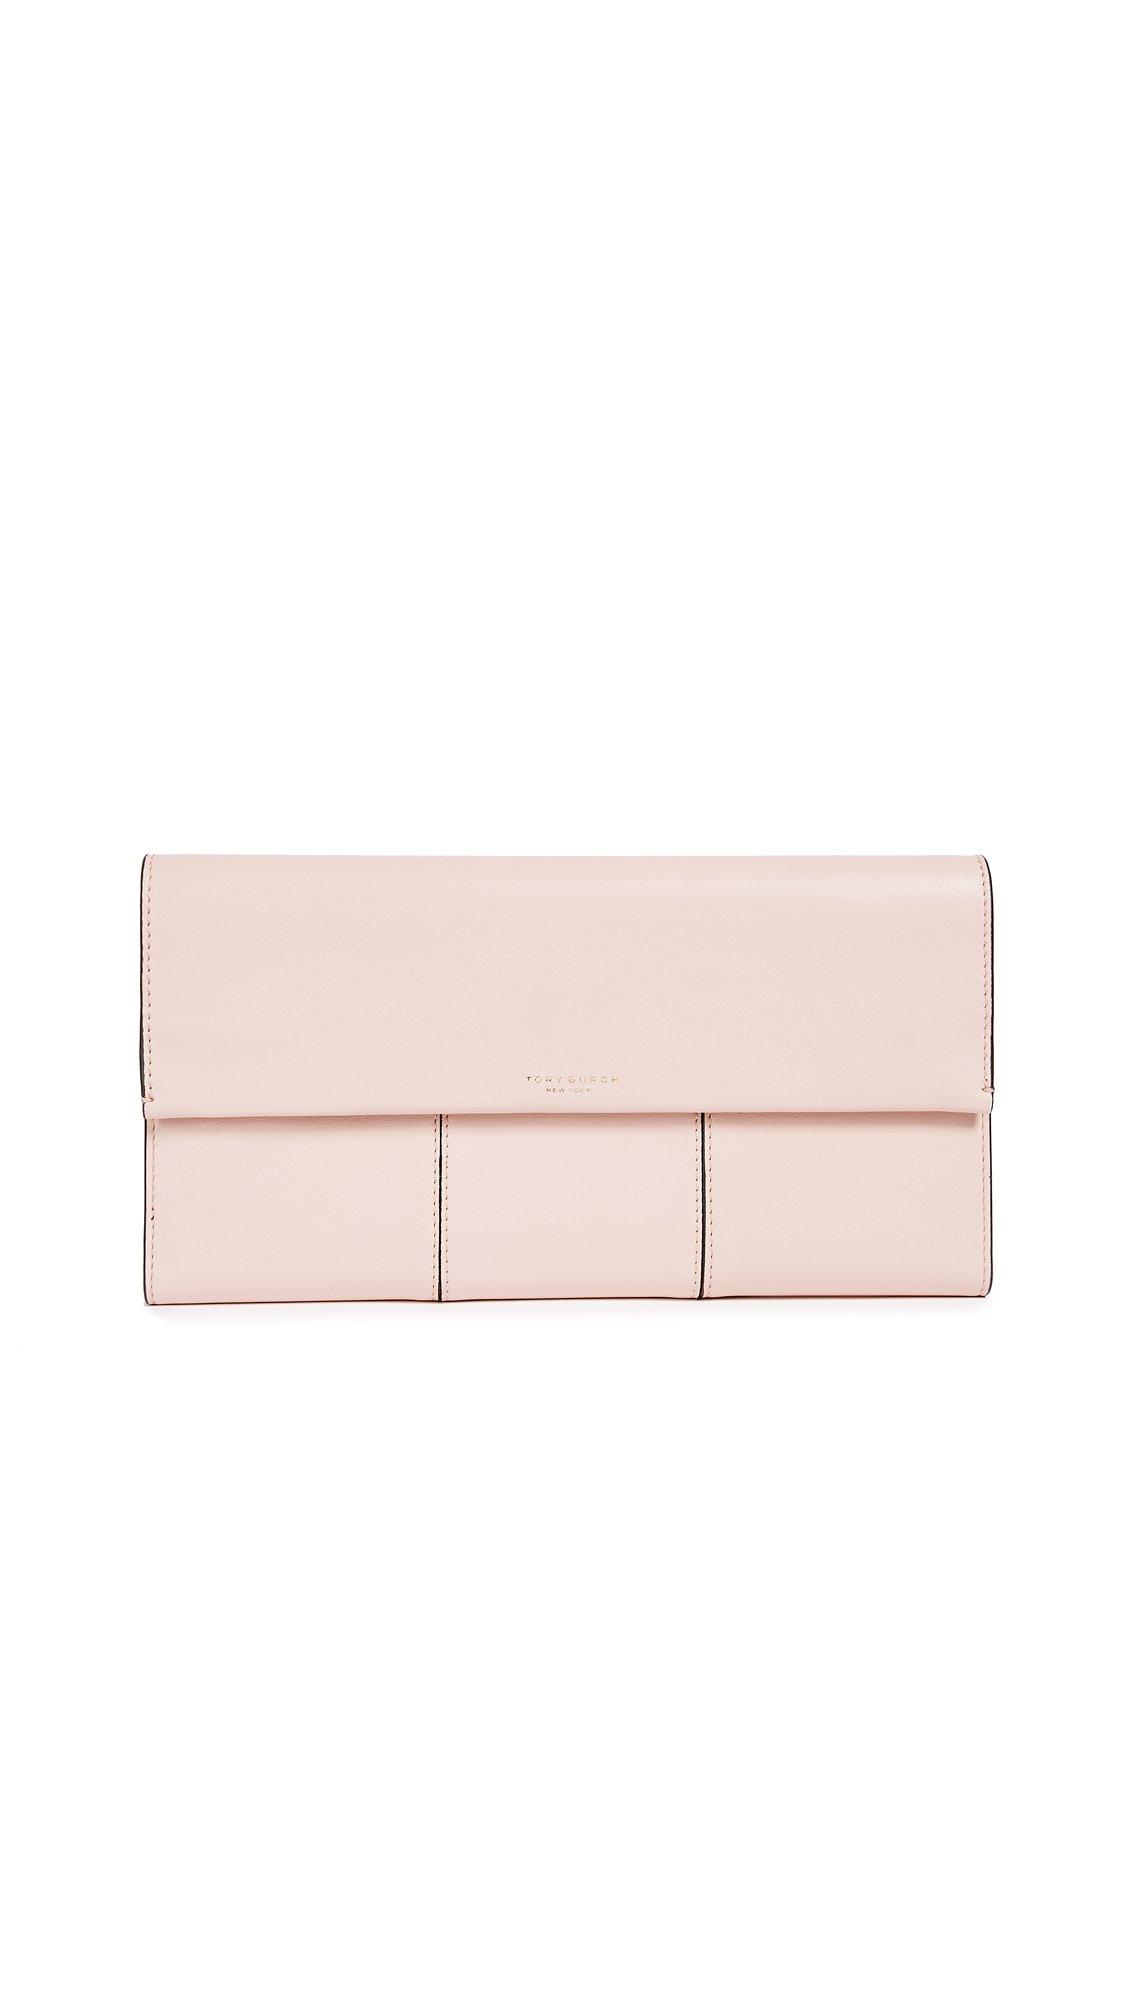 Tory Burch Block T Travel Clutch - Shell Pink